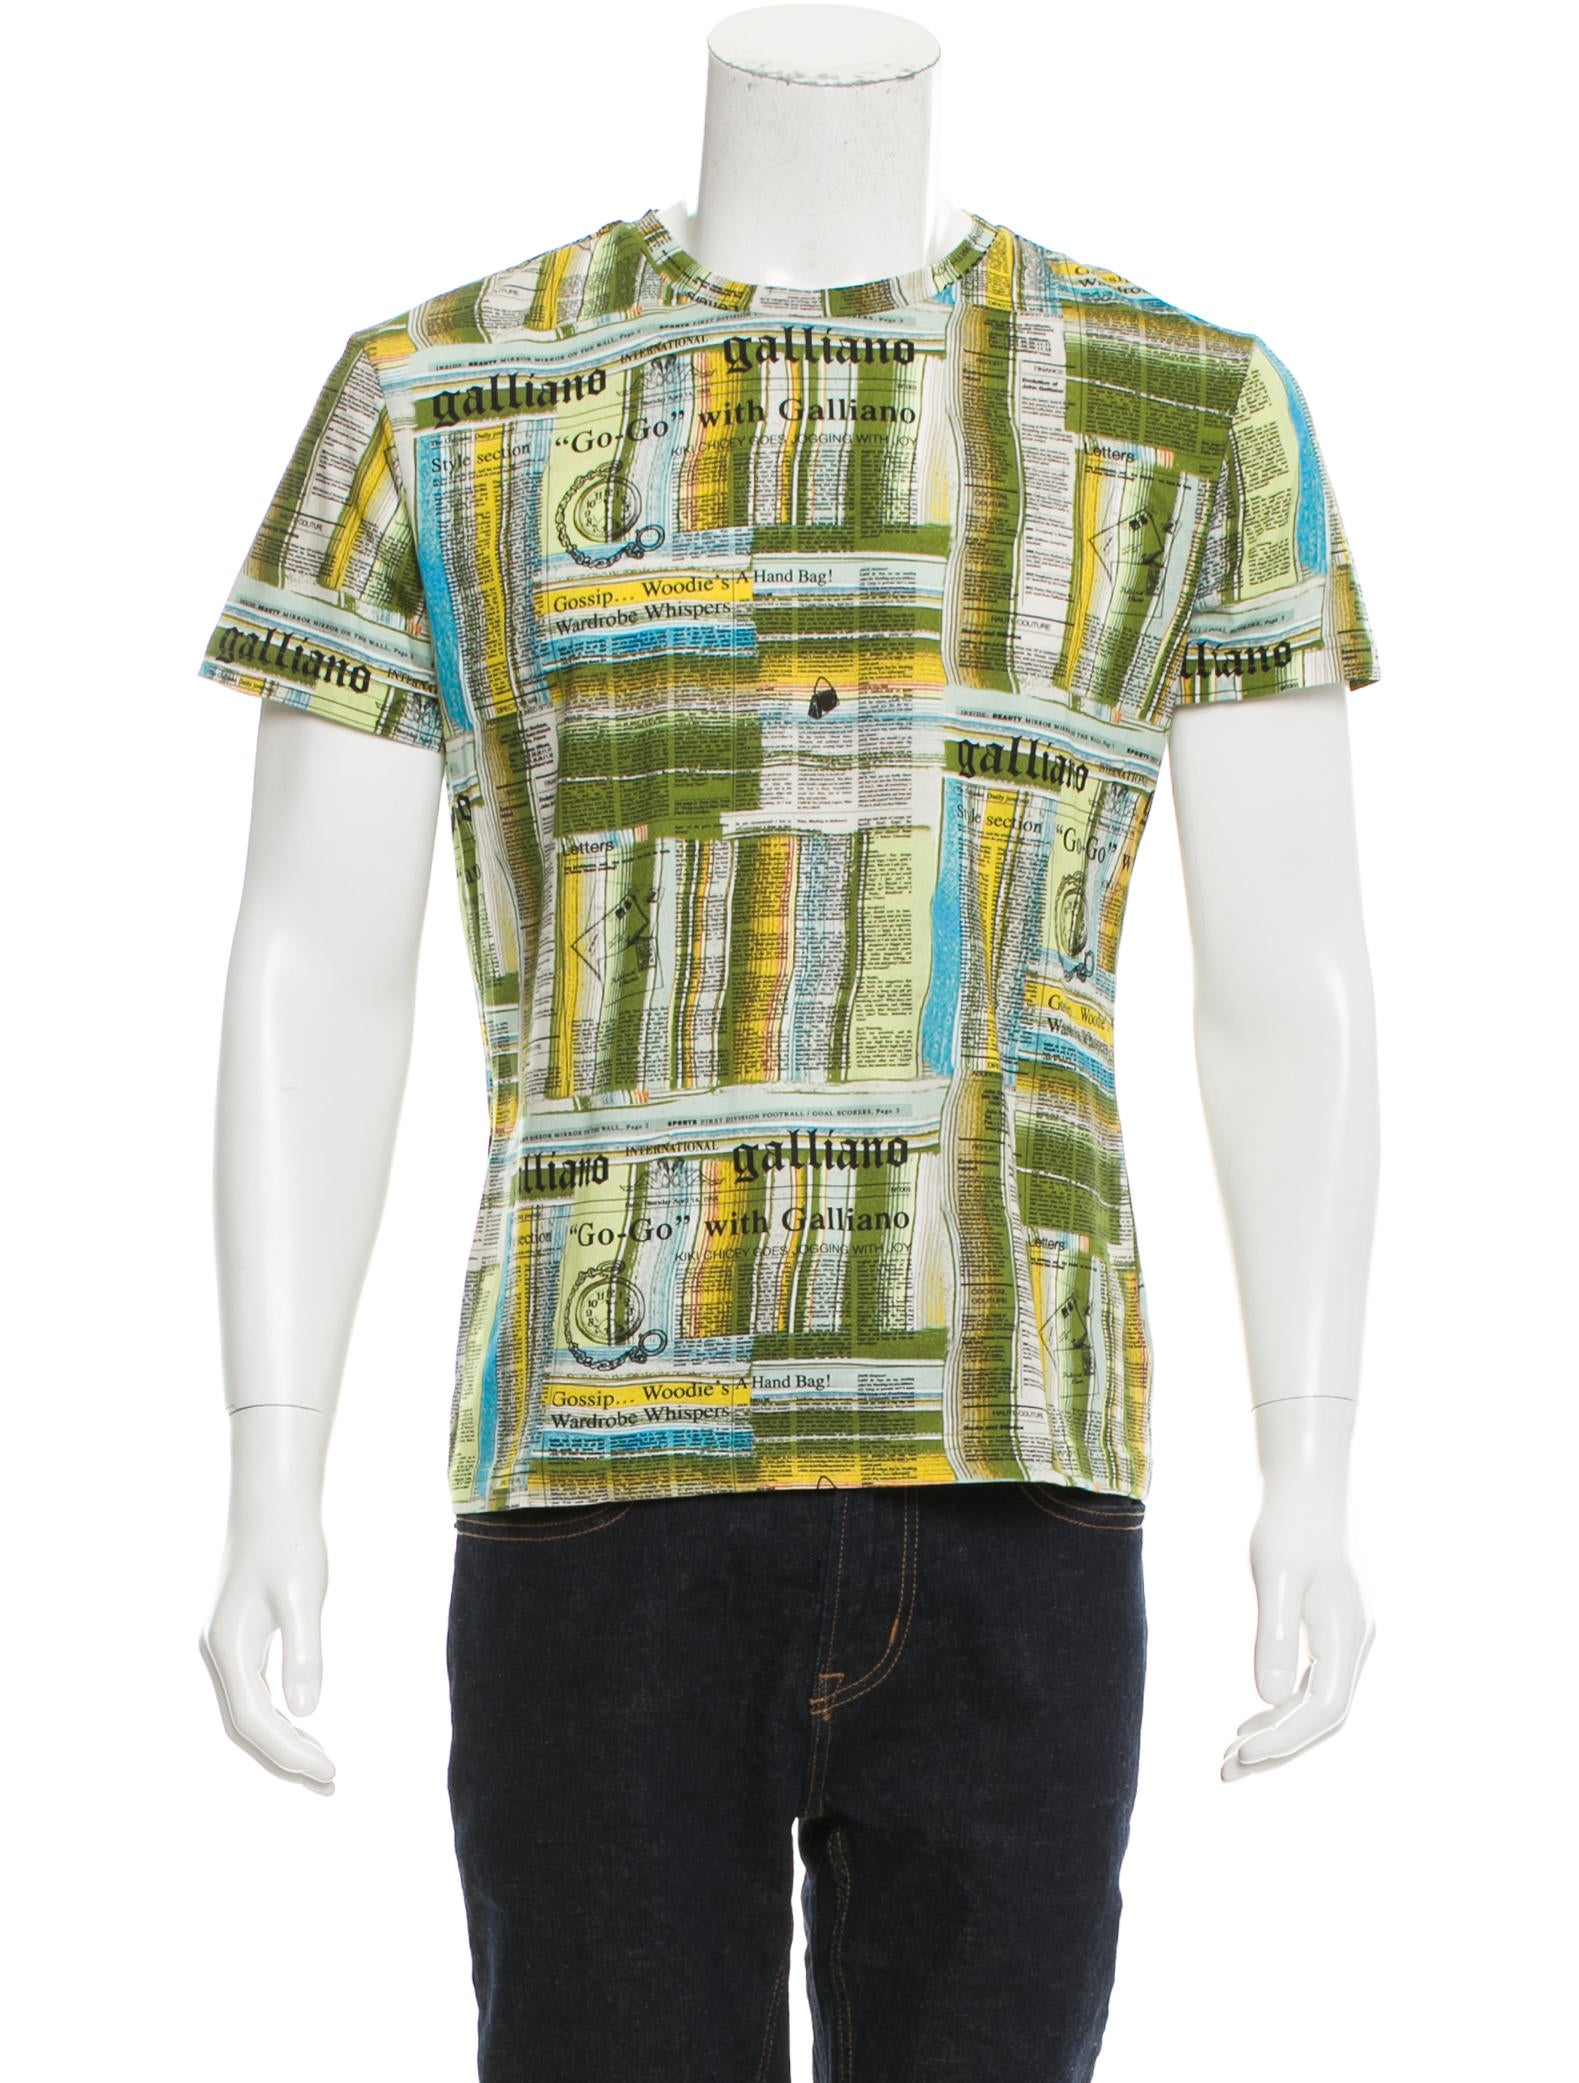 John galliano graphic print t shirt w tags clothing for T shirt graphic printing